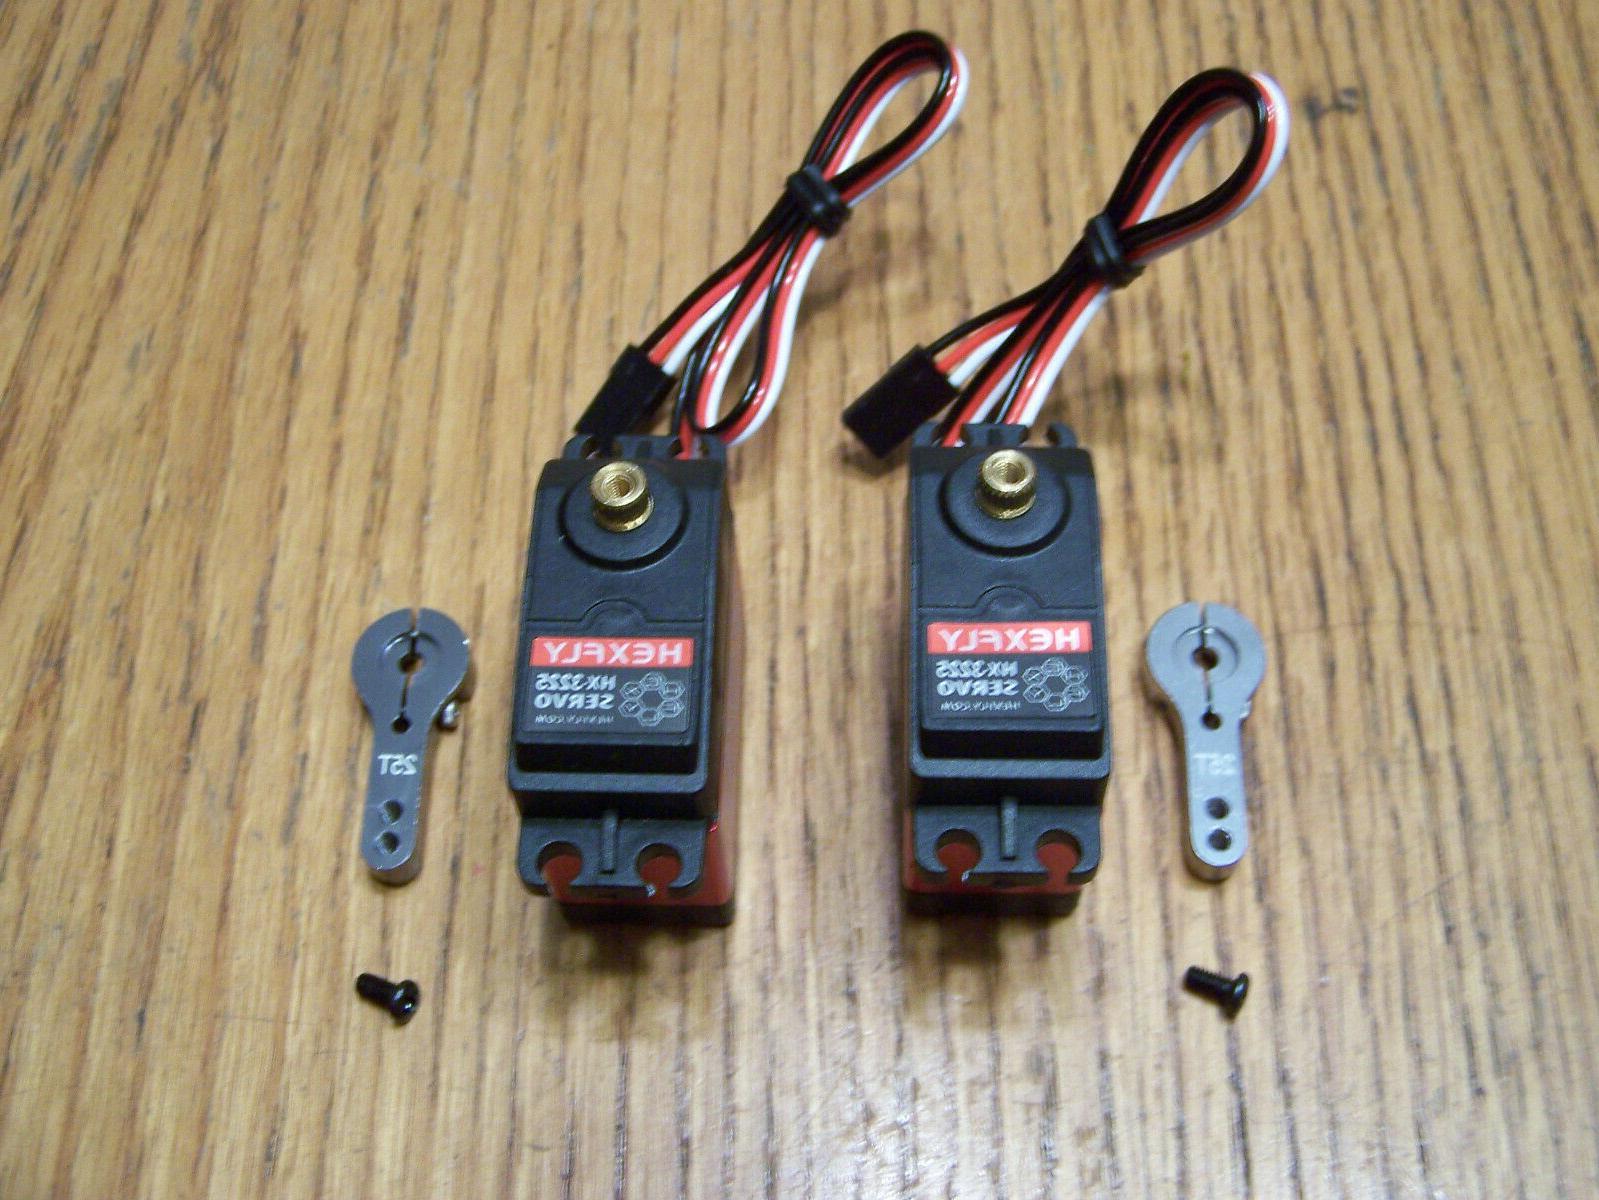 2 redcat hexfly hx 3225 metal gear